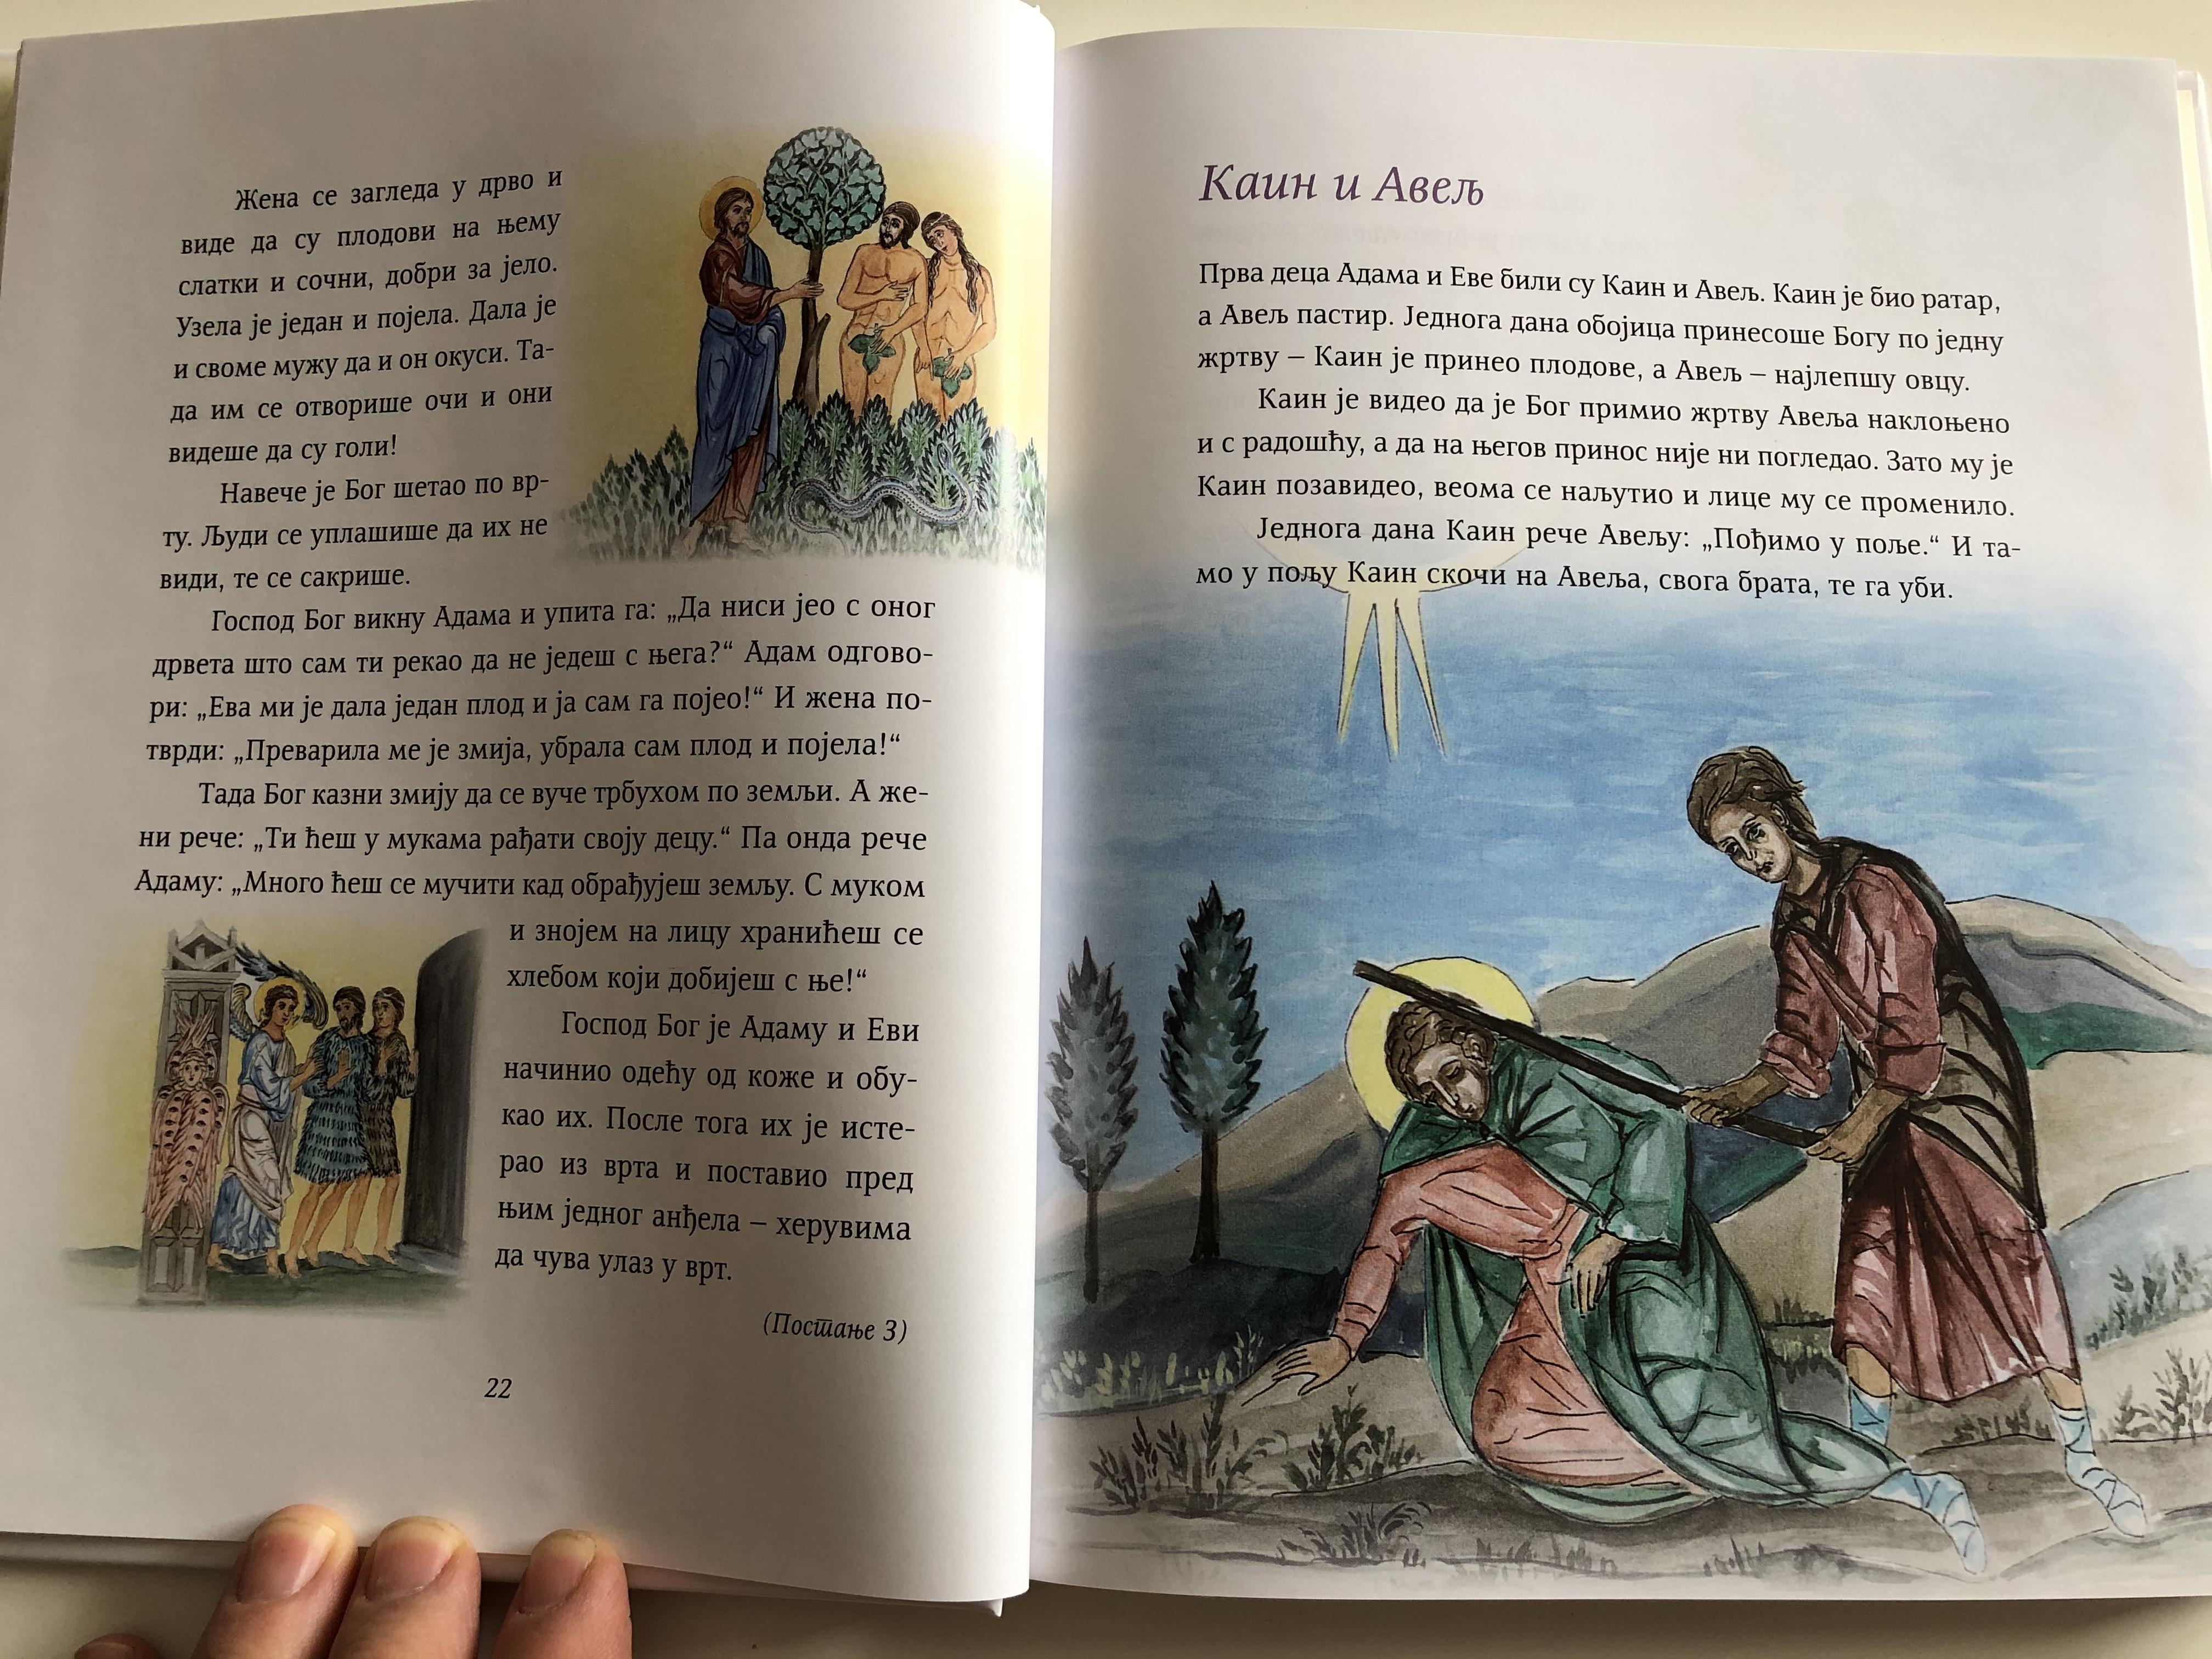 -by-marta-kapetanaku-ksinopulu-keti-hioteli-serbian-edition-of-children-s-bible-reader-8.jpg